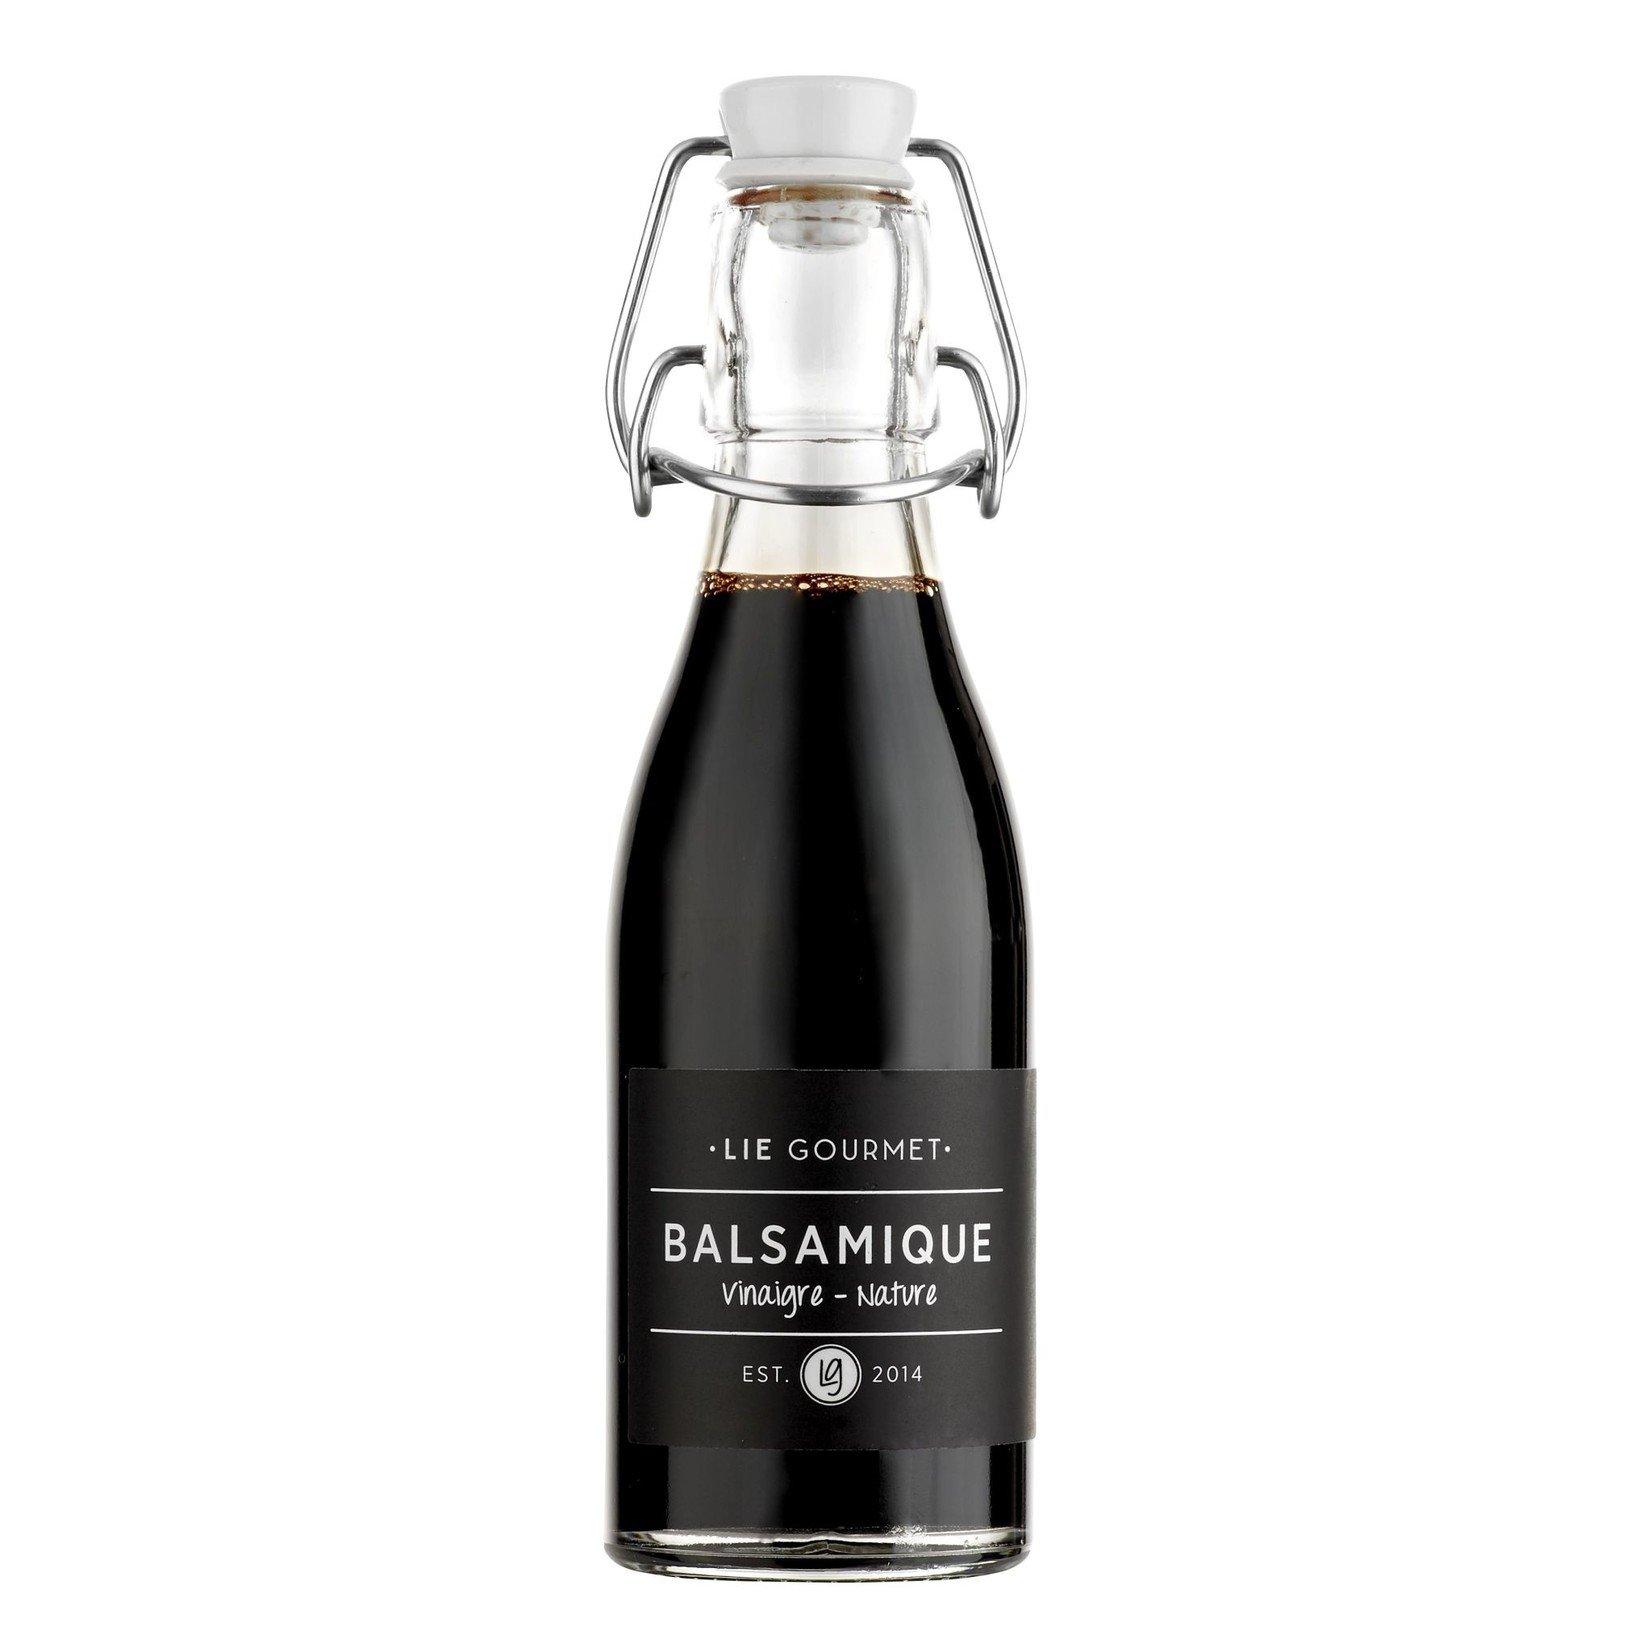 Lie Gourmet Balsamic vinegar neutral